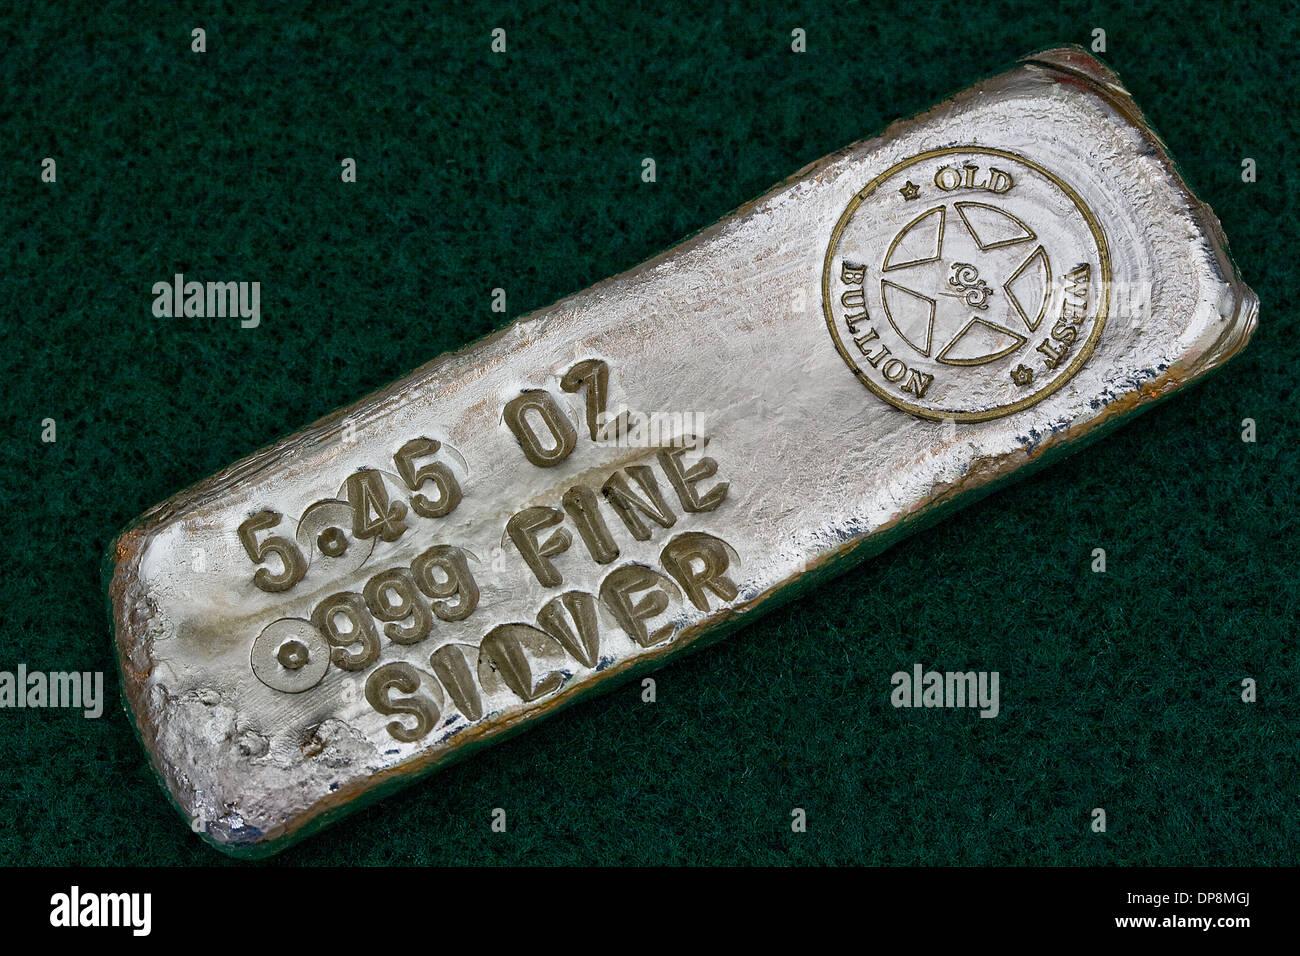 Stamped Silver Bullion Bar - Poured Ingot - Stock Image